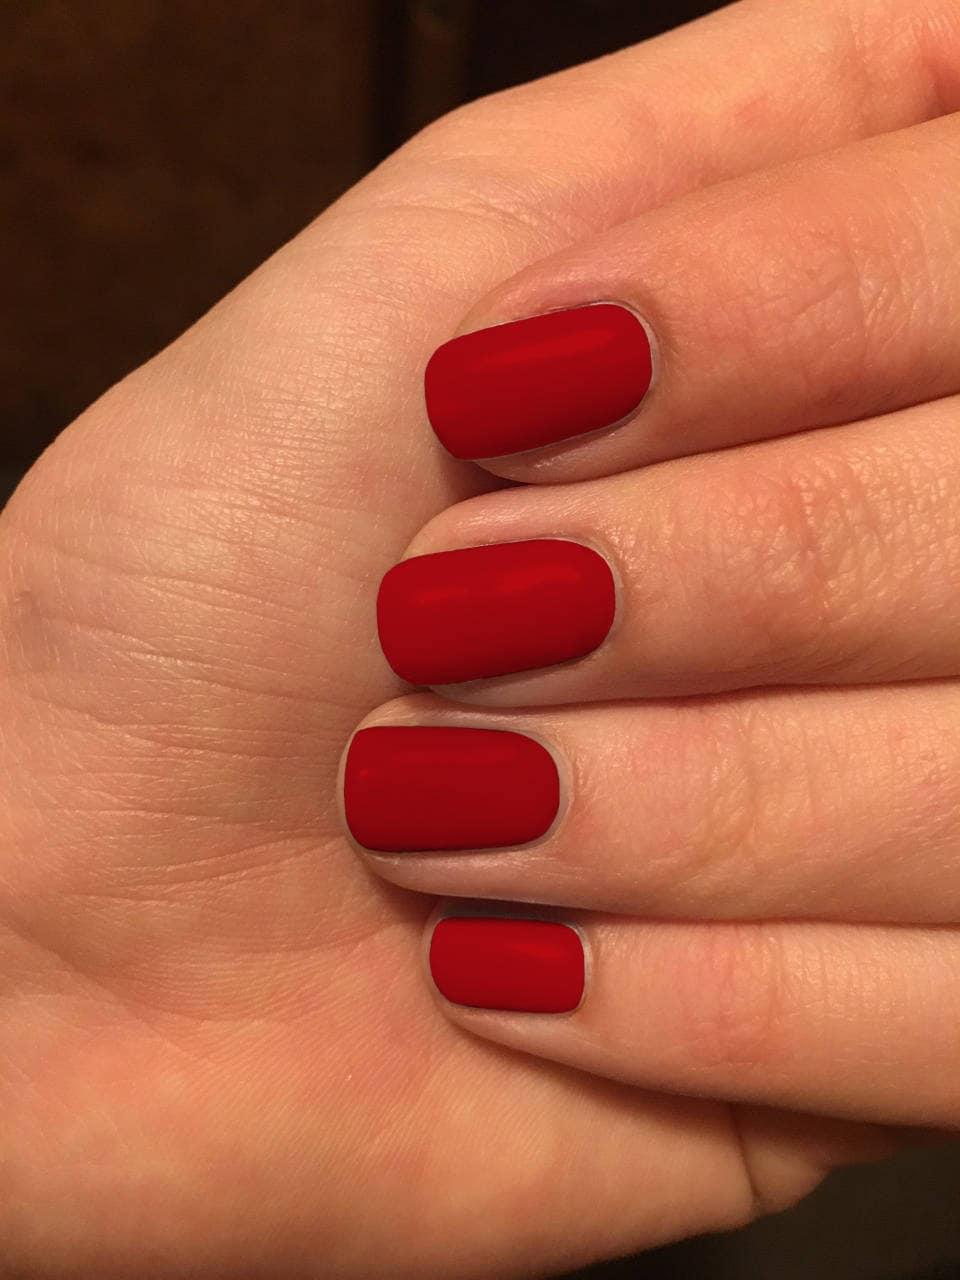 Nail wraps, Red nail wraps, Ruby Red colored nails, nail polish ...